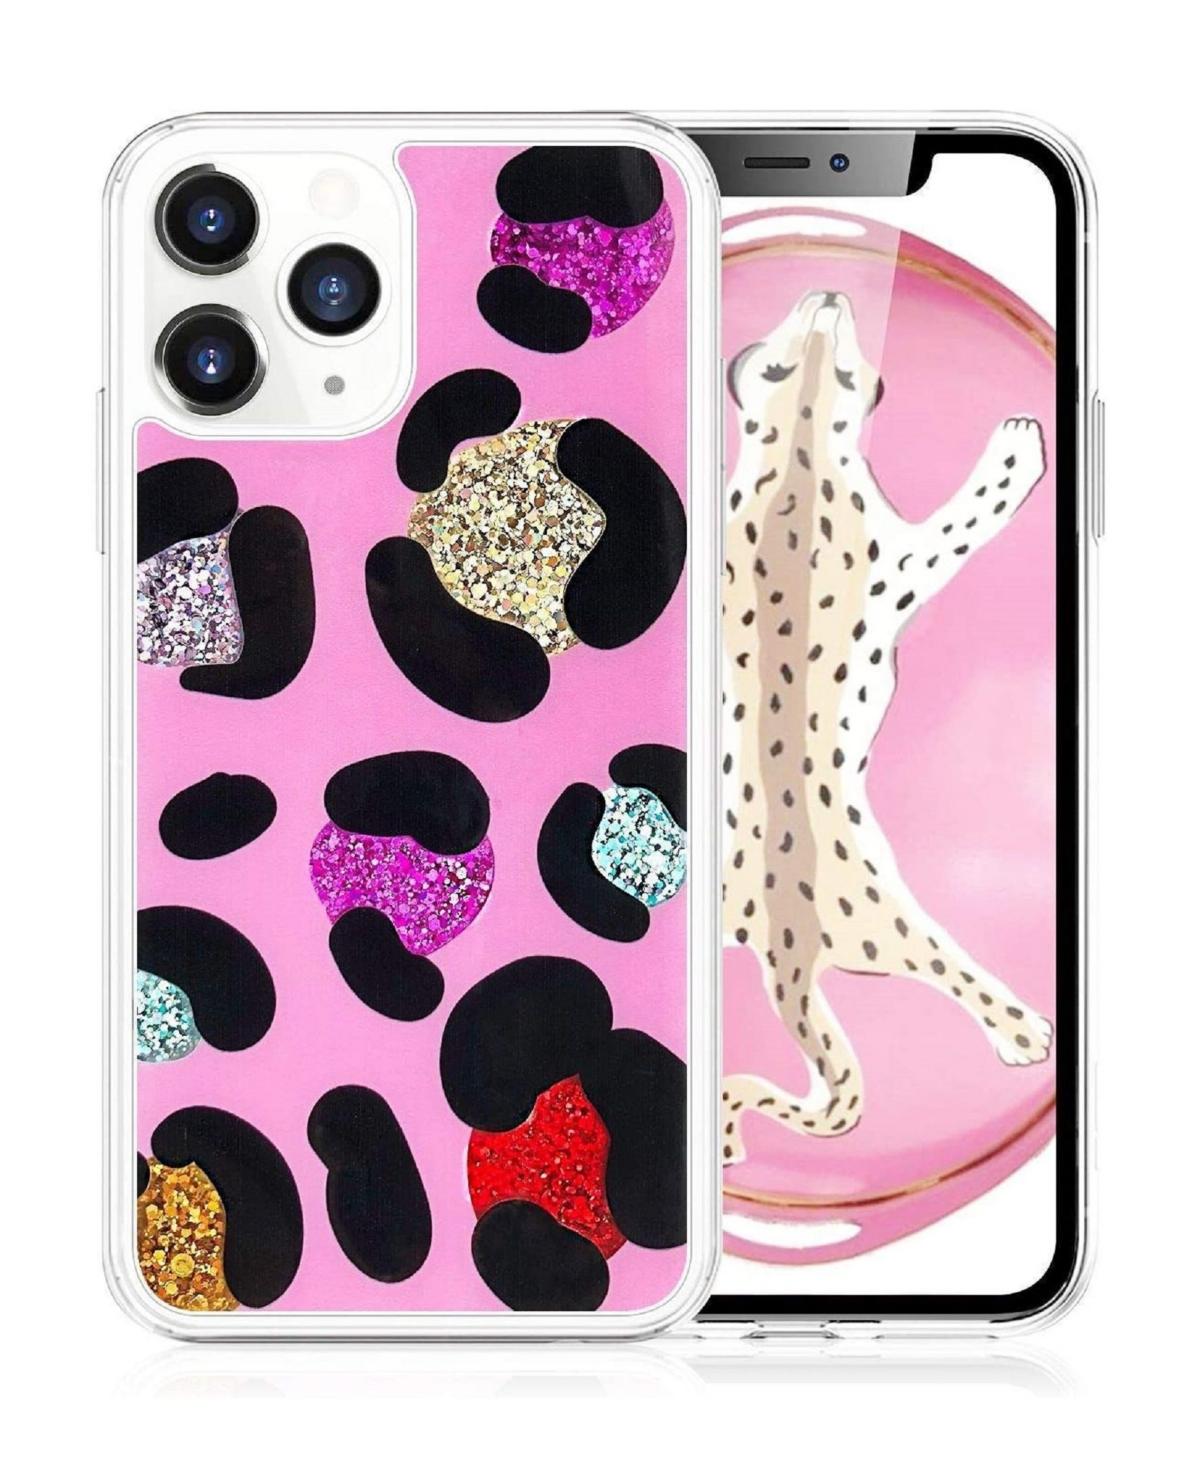 Milanblocks iPhone 11 Pro Leopard Glitter Phone Case